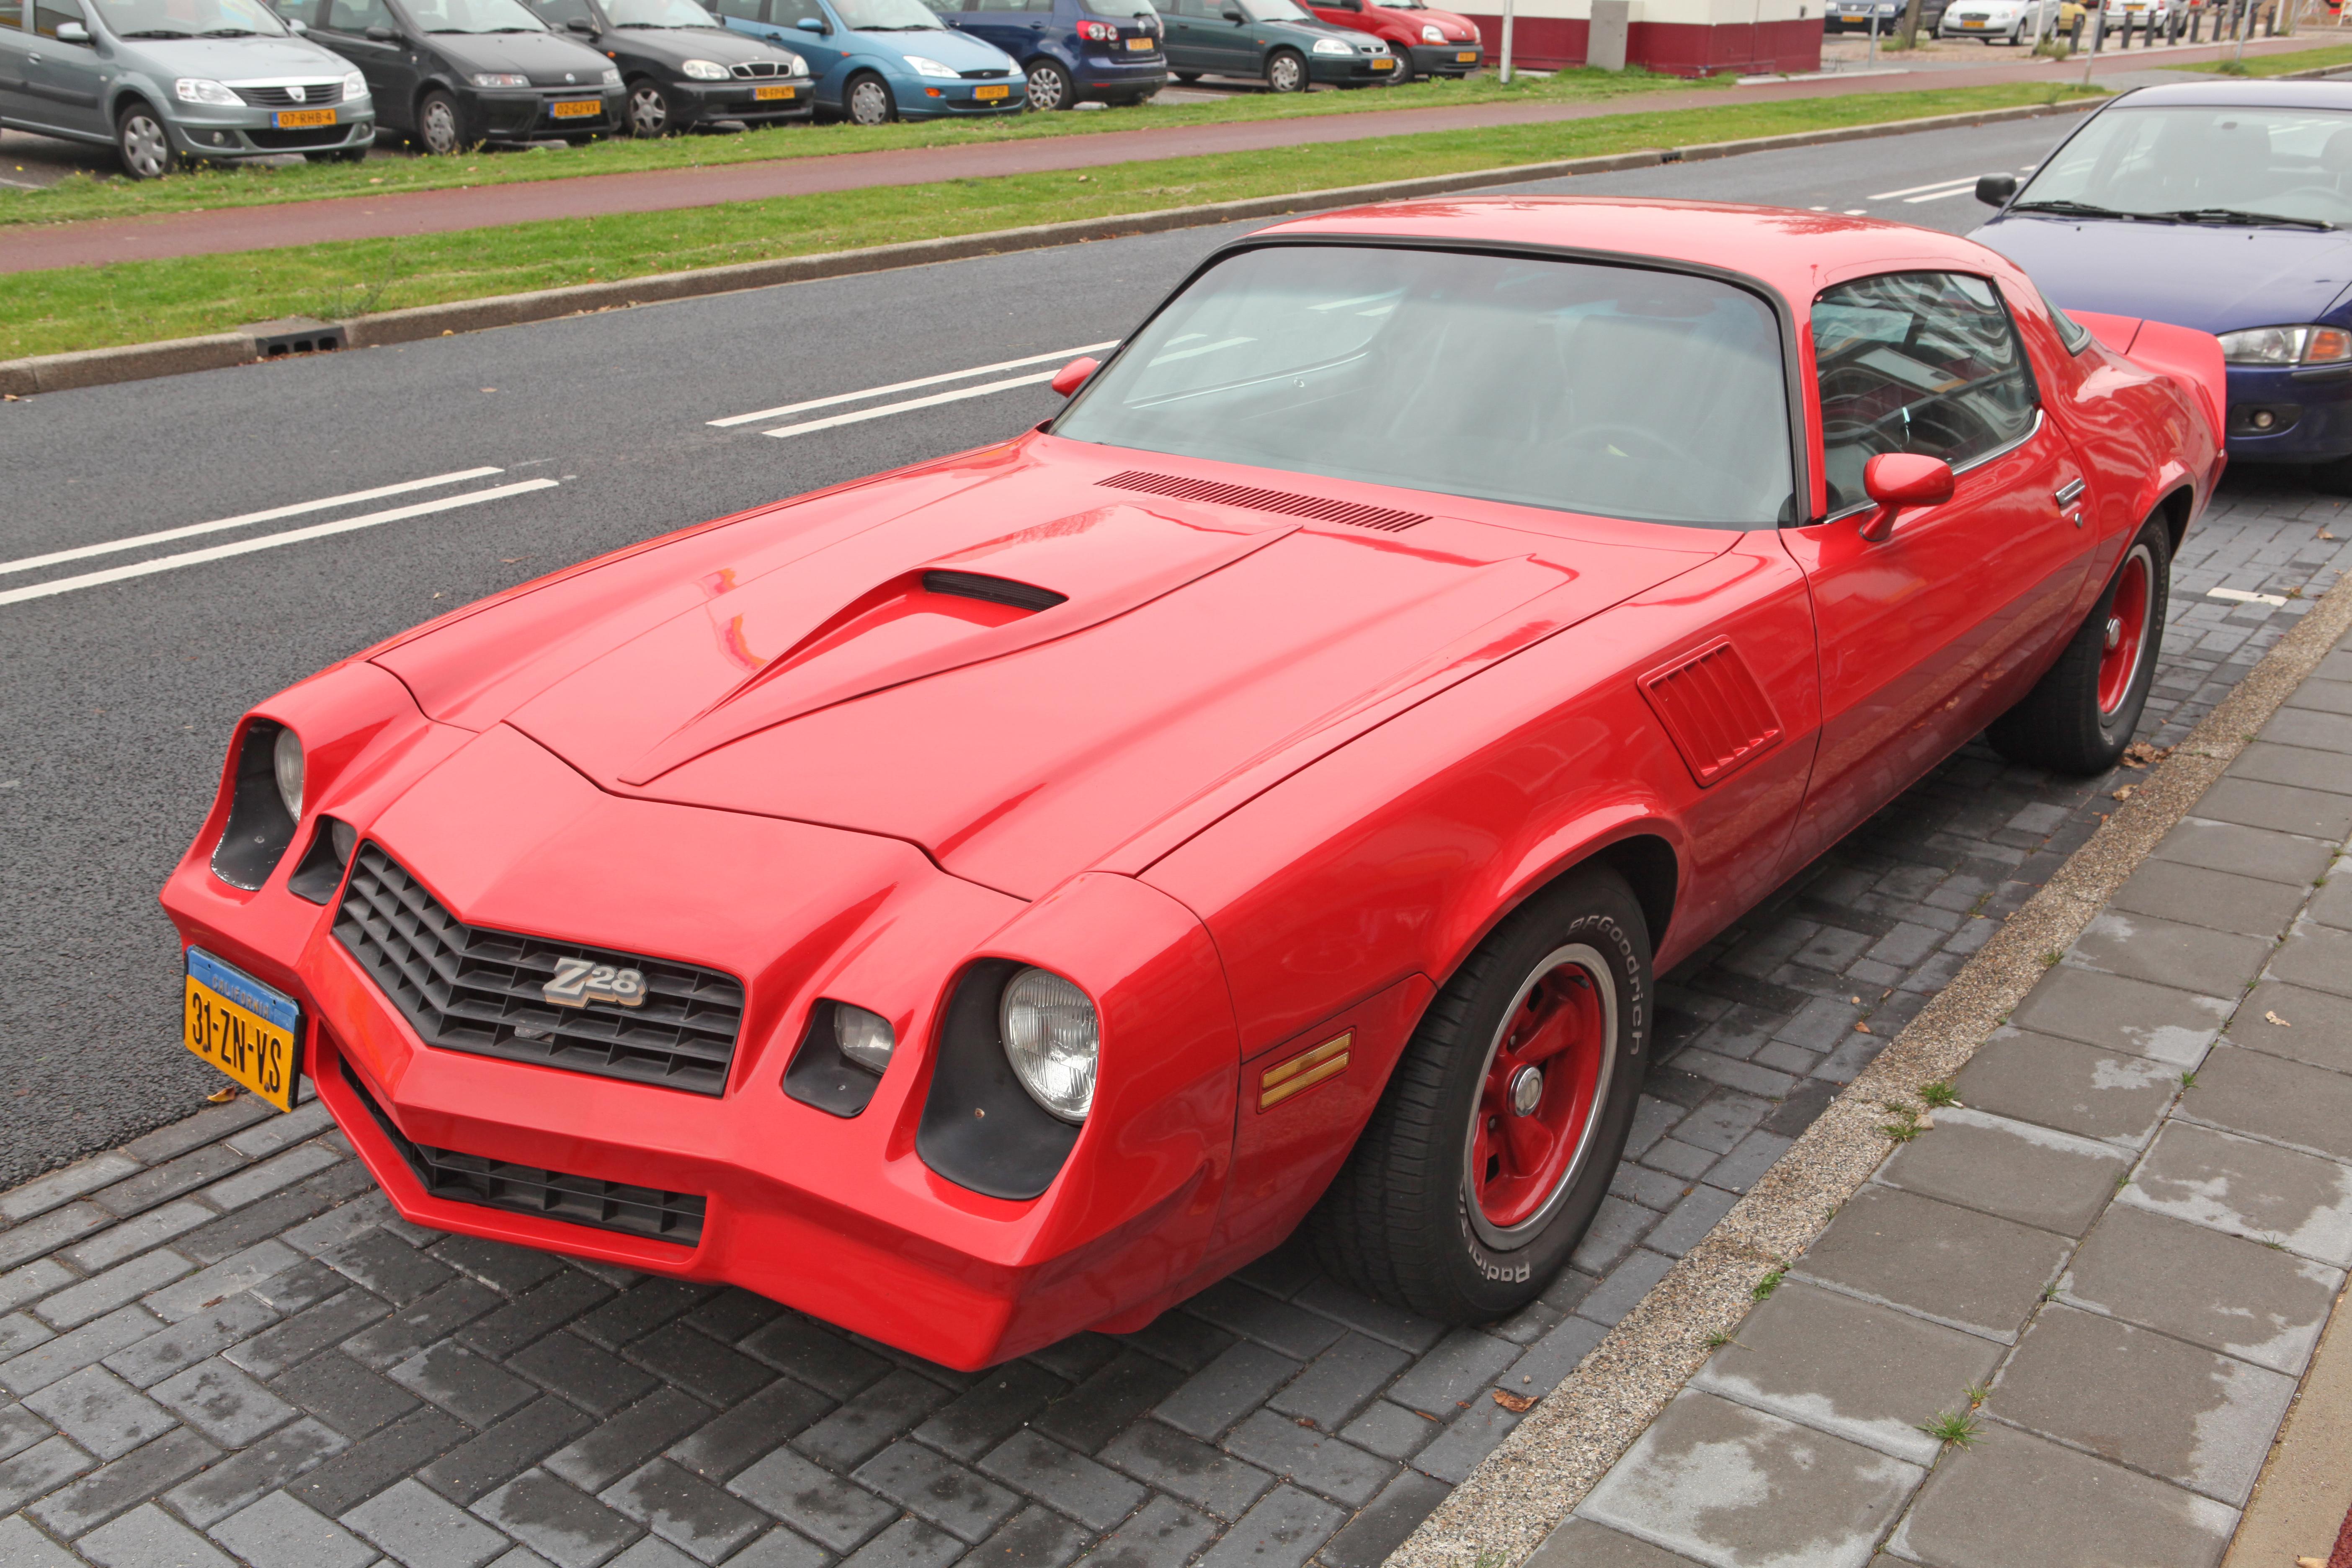 File:1978 Chevrolet Camaro jpg - Wikimedia Commons